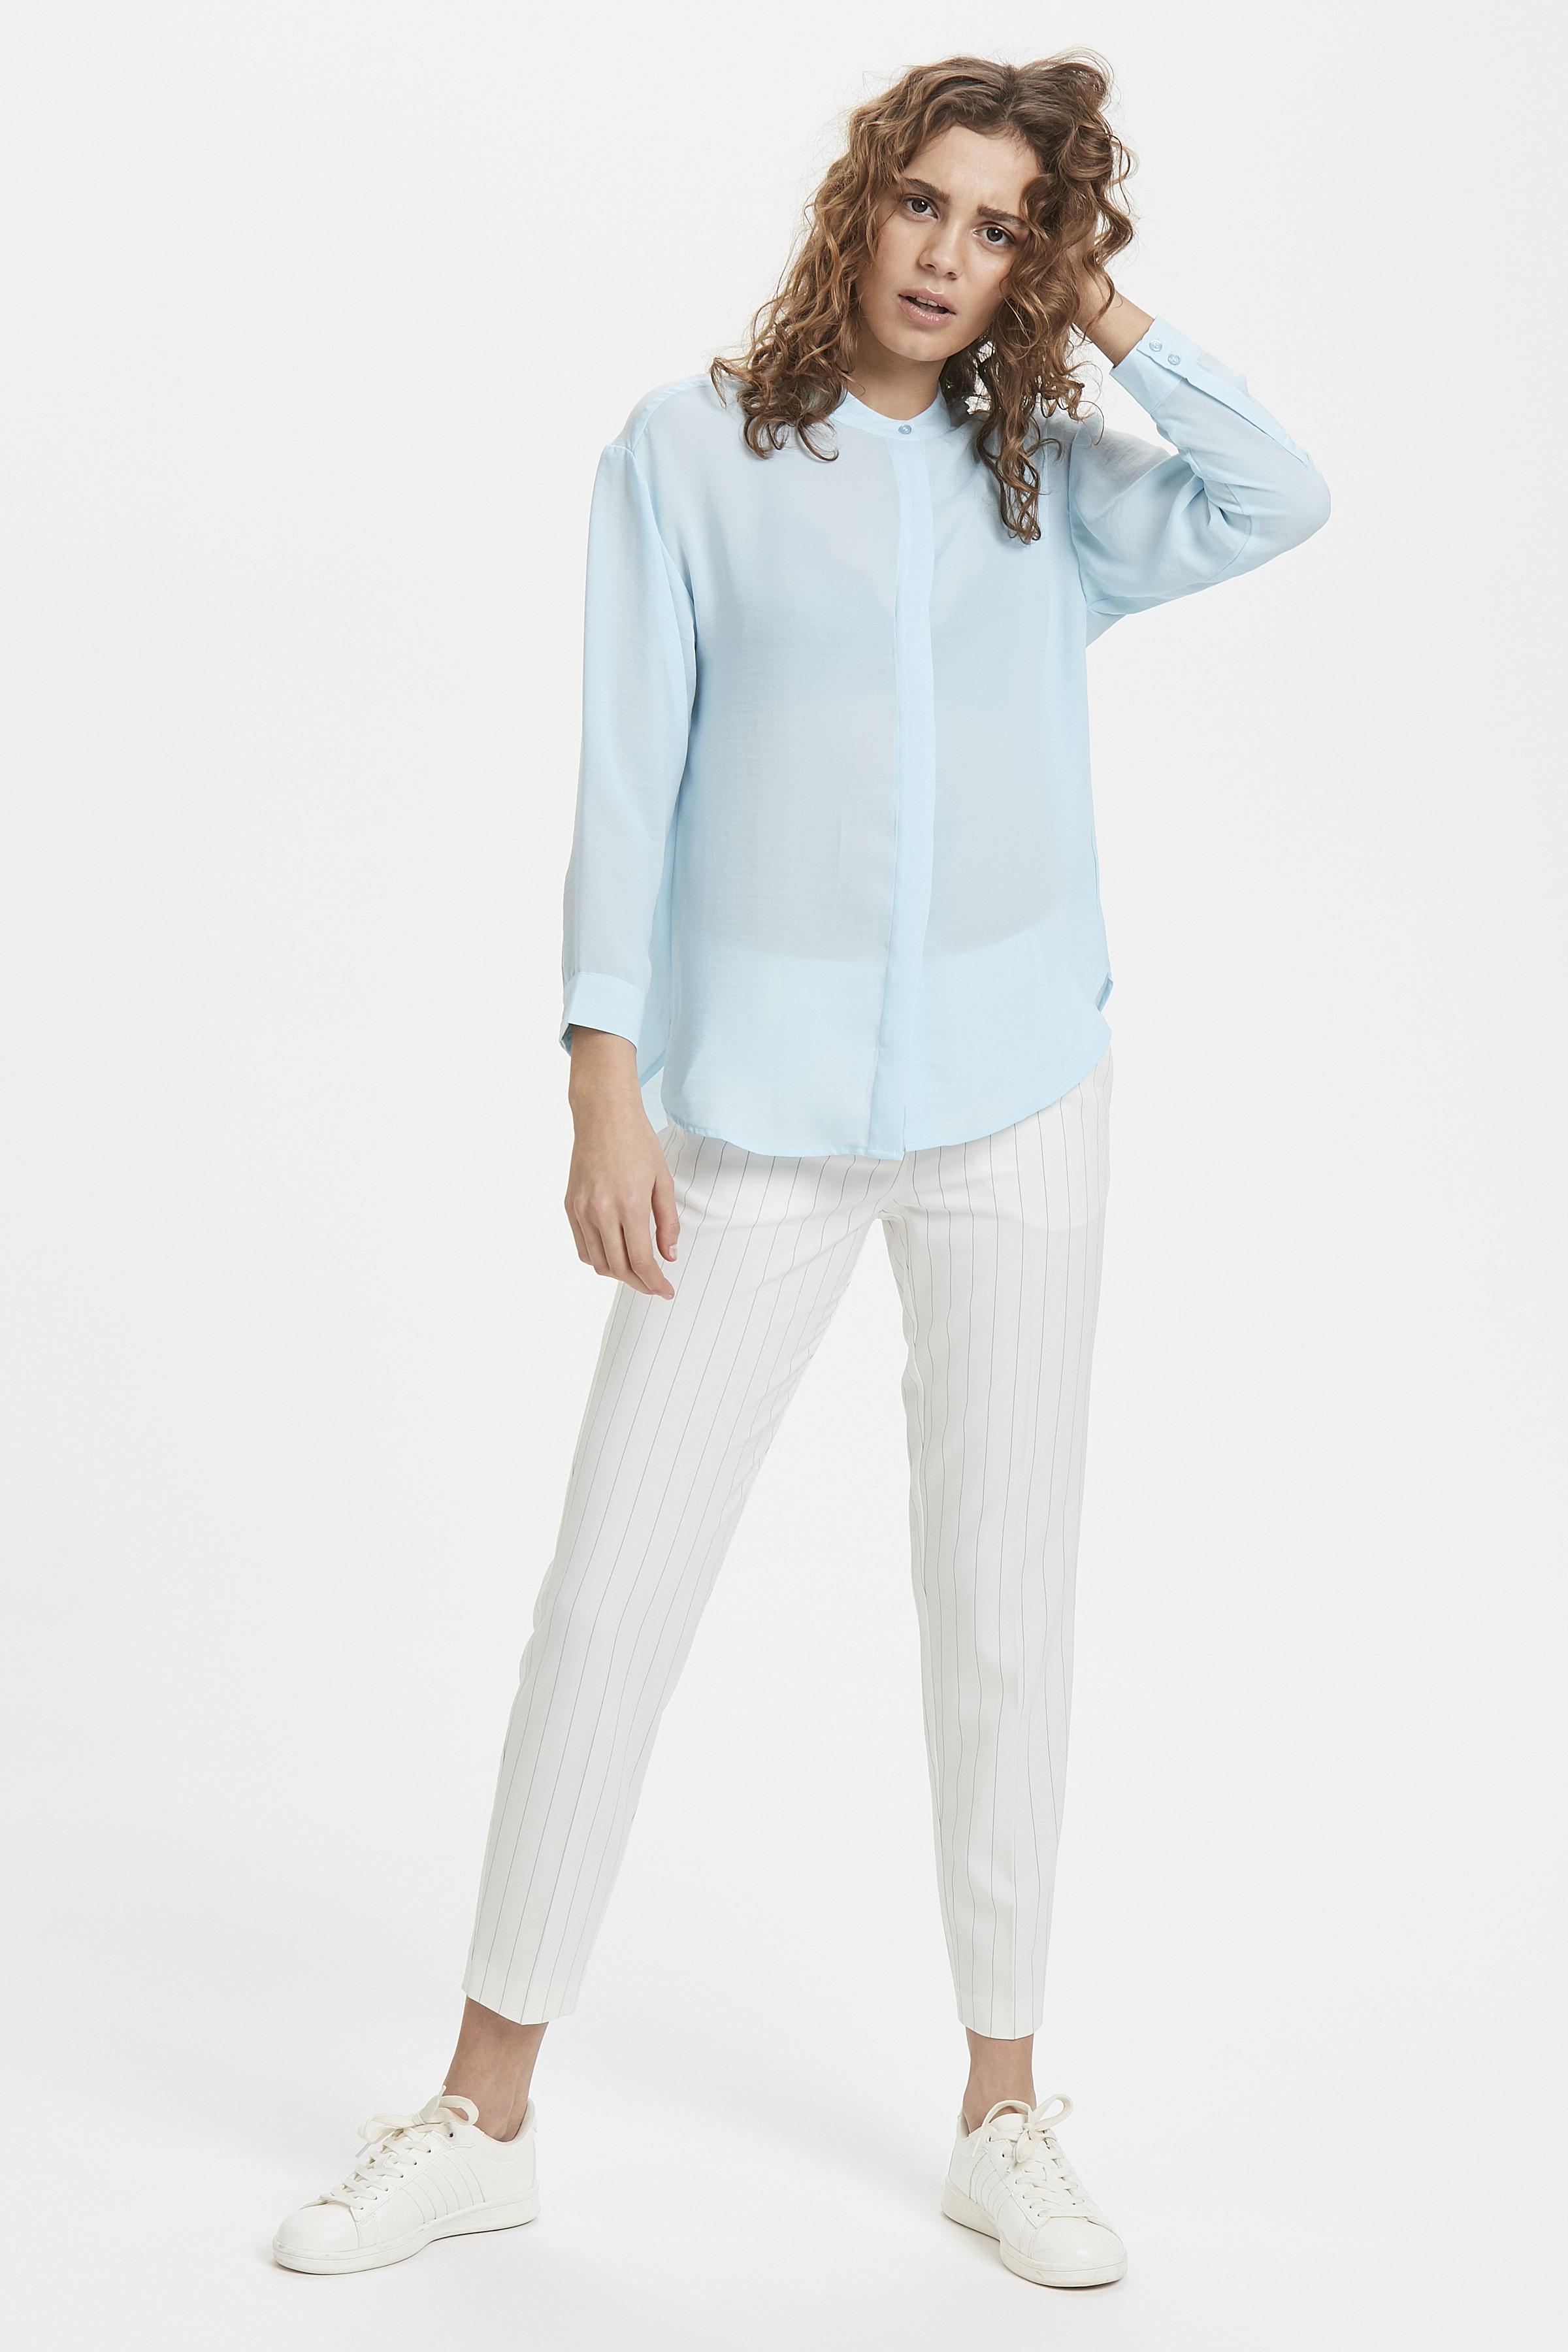 Corydalis Blue Long sleeved shirt fra Ichi – Køb Corydalis Blue Long sleeved shirt fra str. 34-42 her